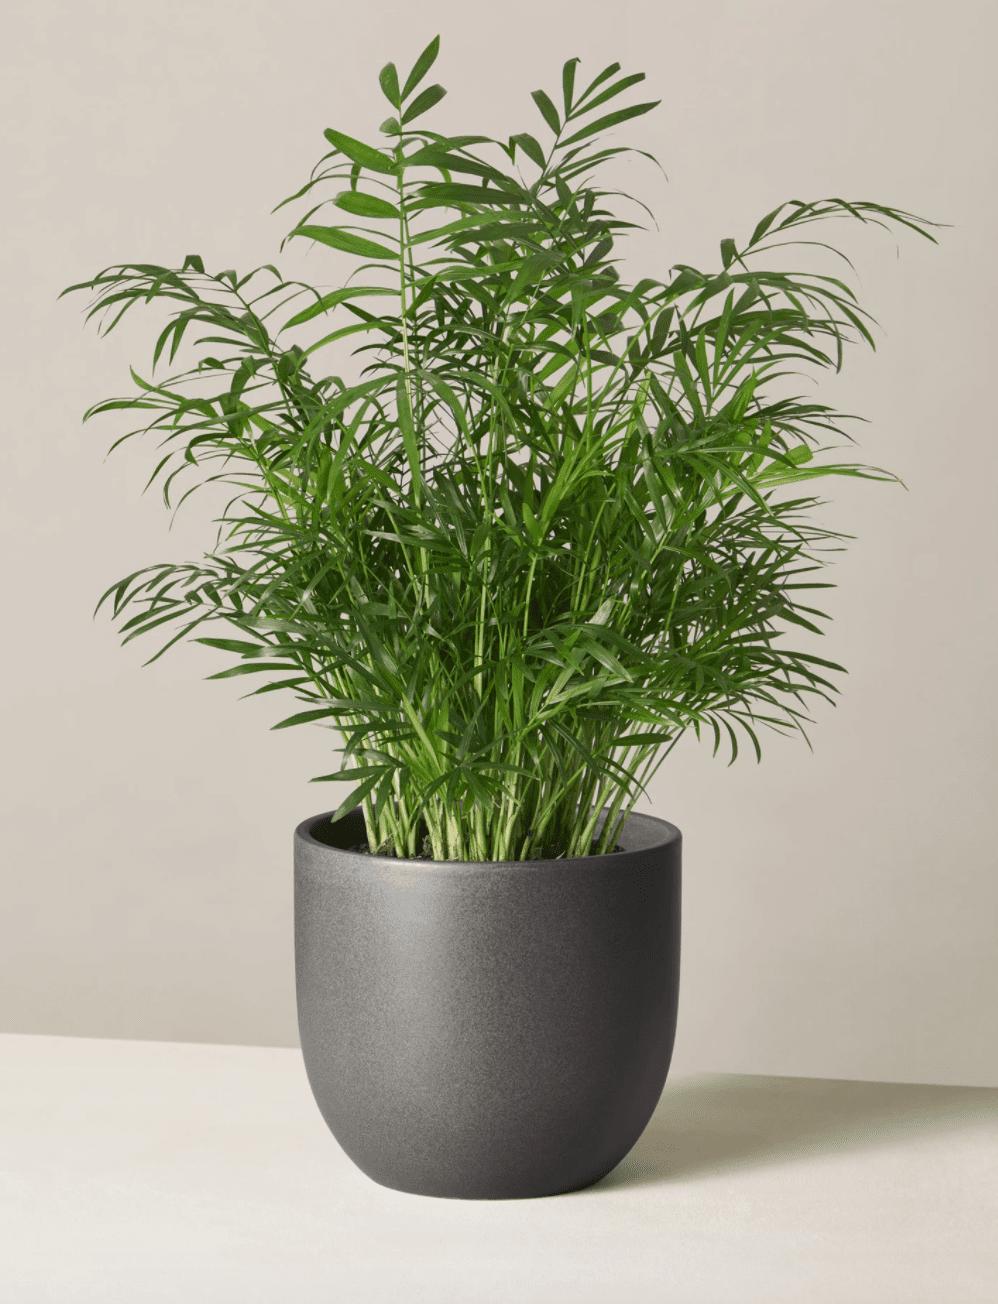 parlor palm in black pot